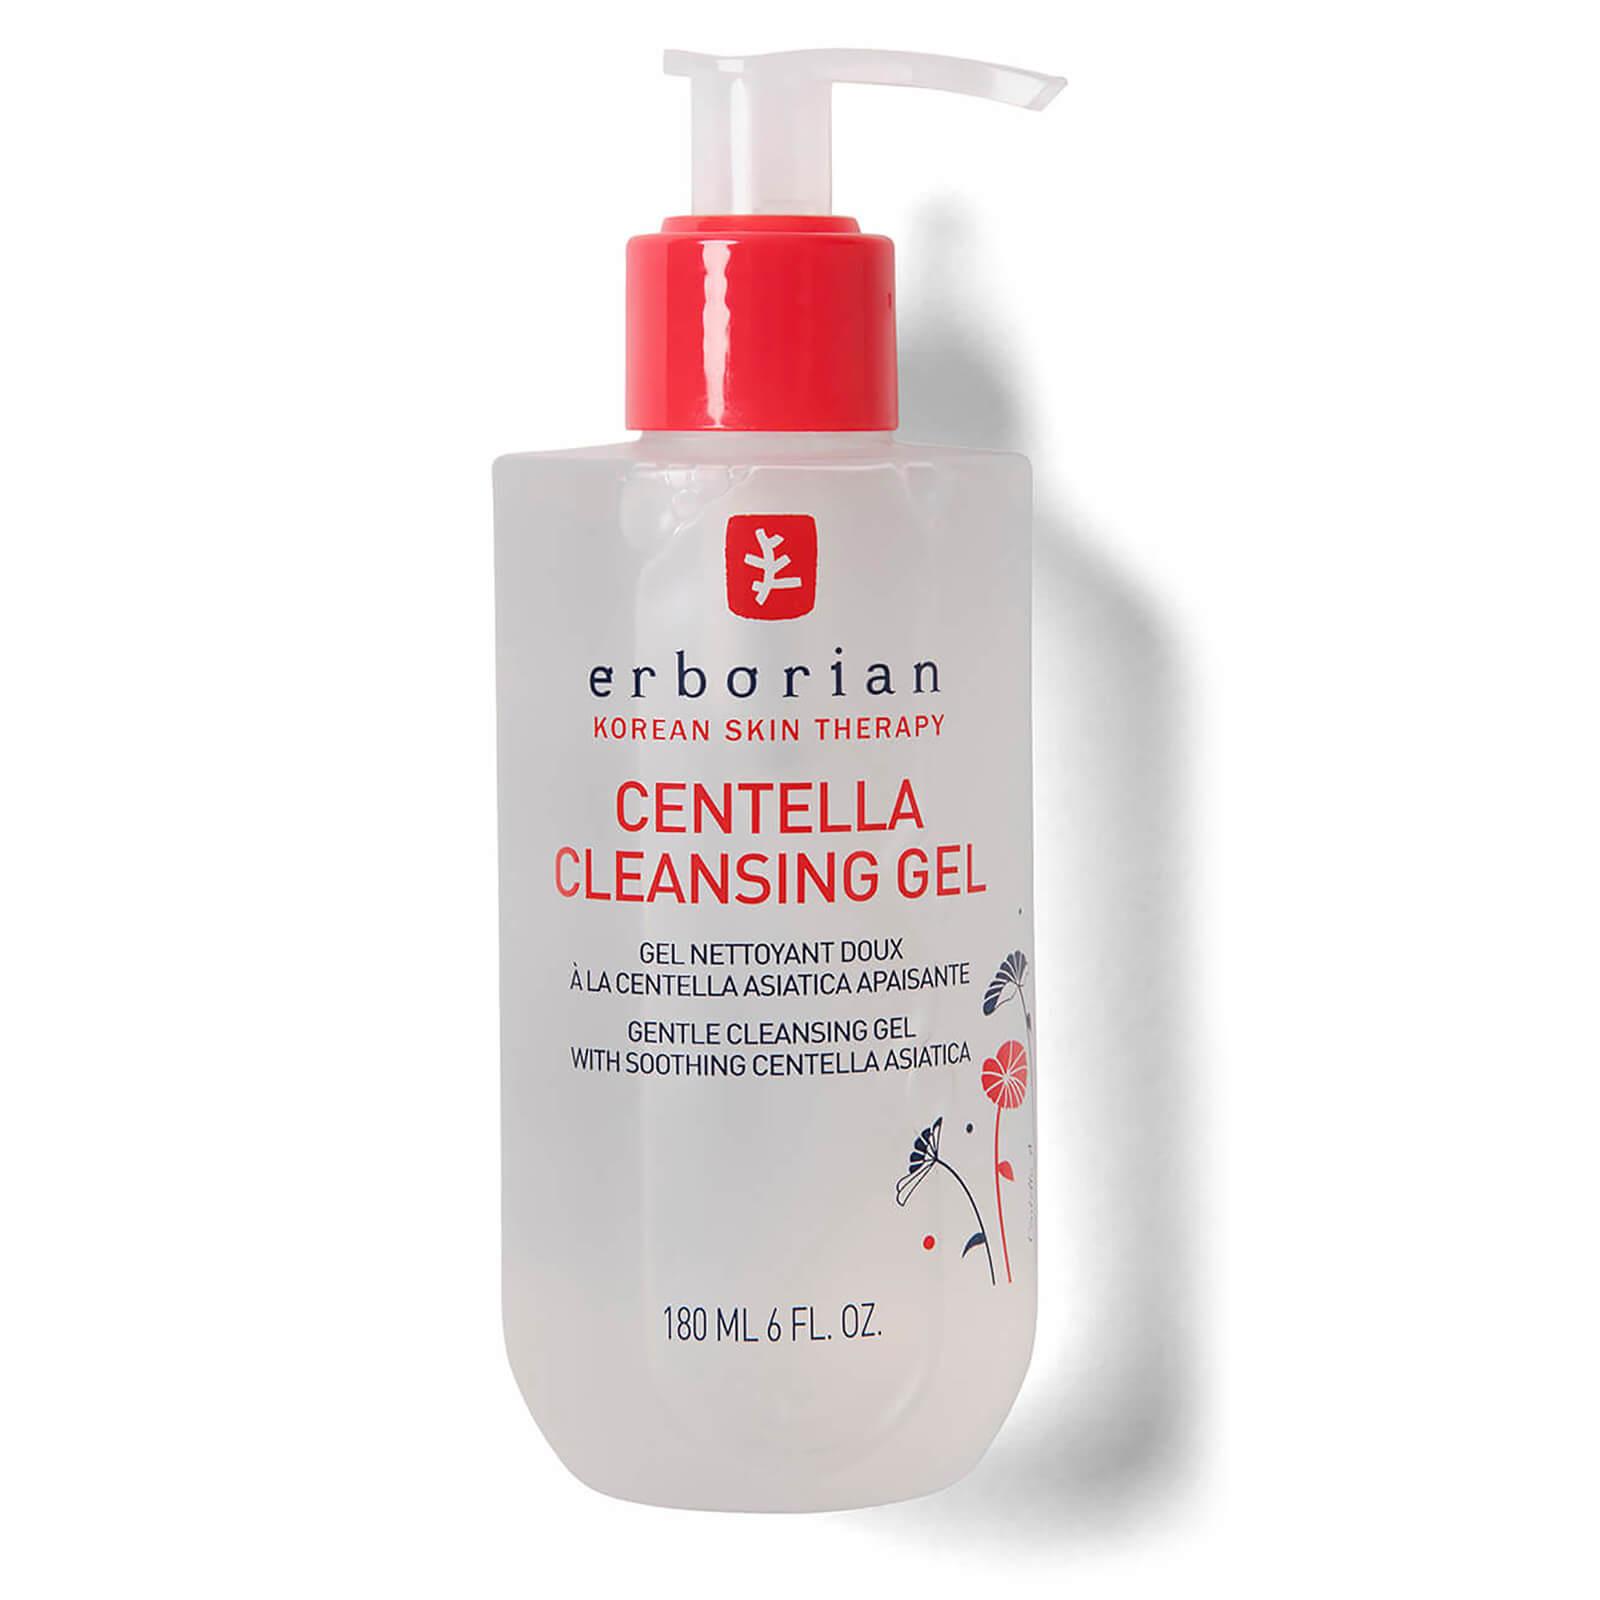 Centella Cleansing Gel - 180ml - Erborian